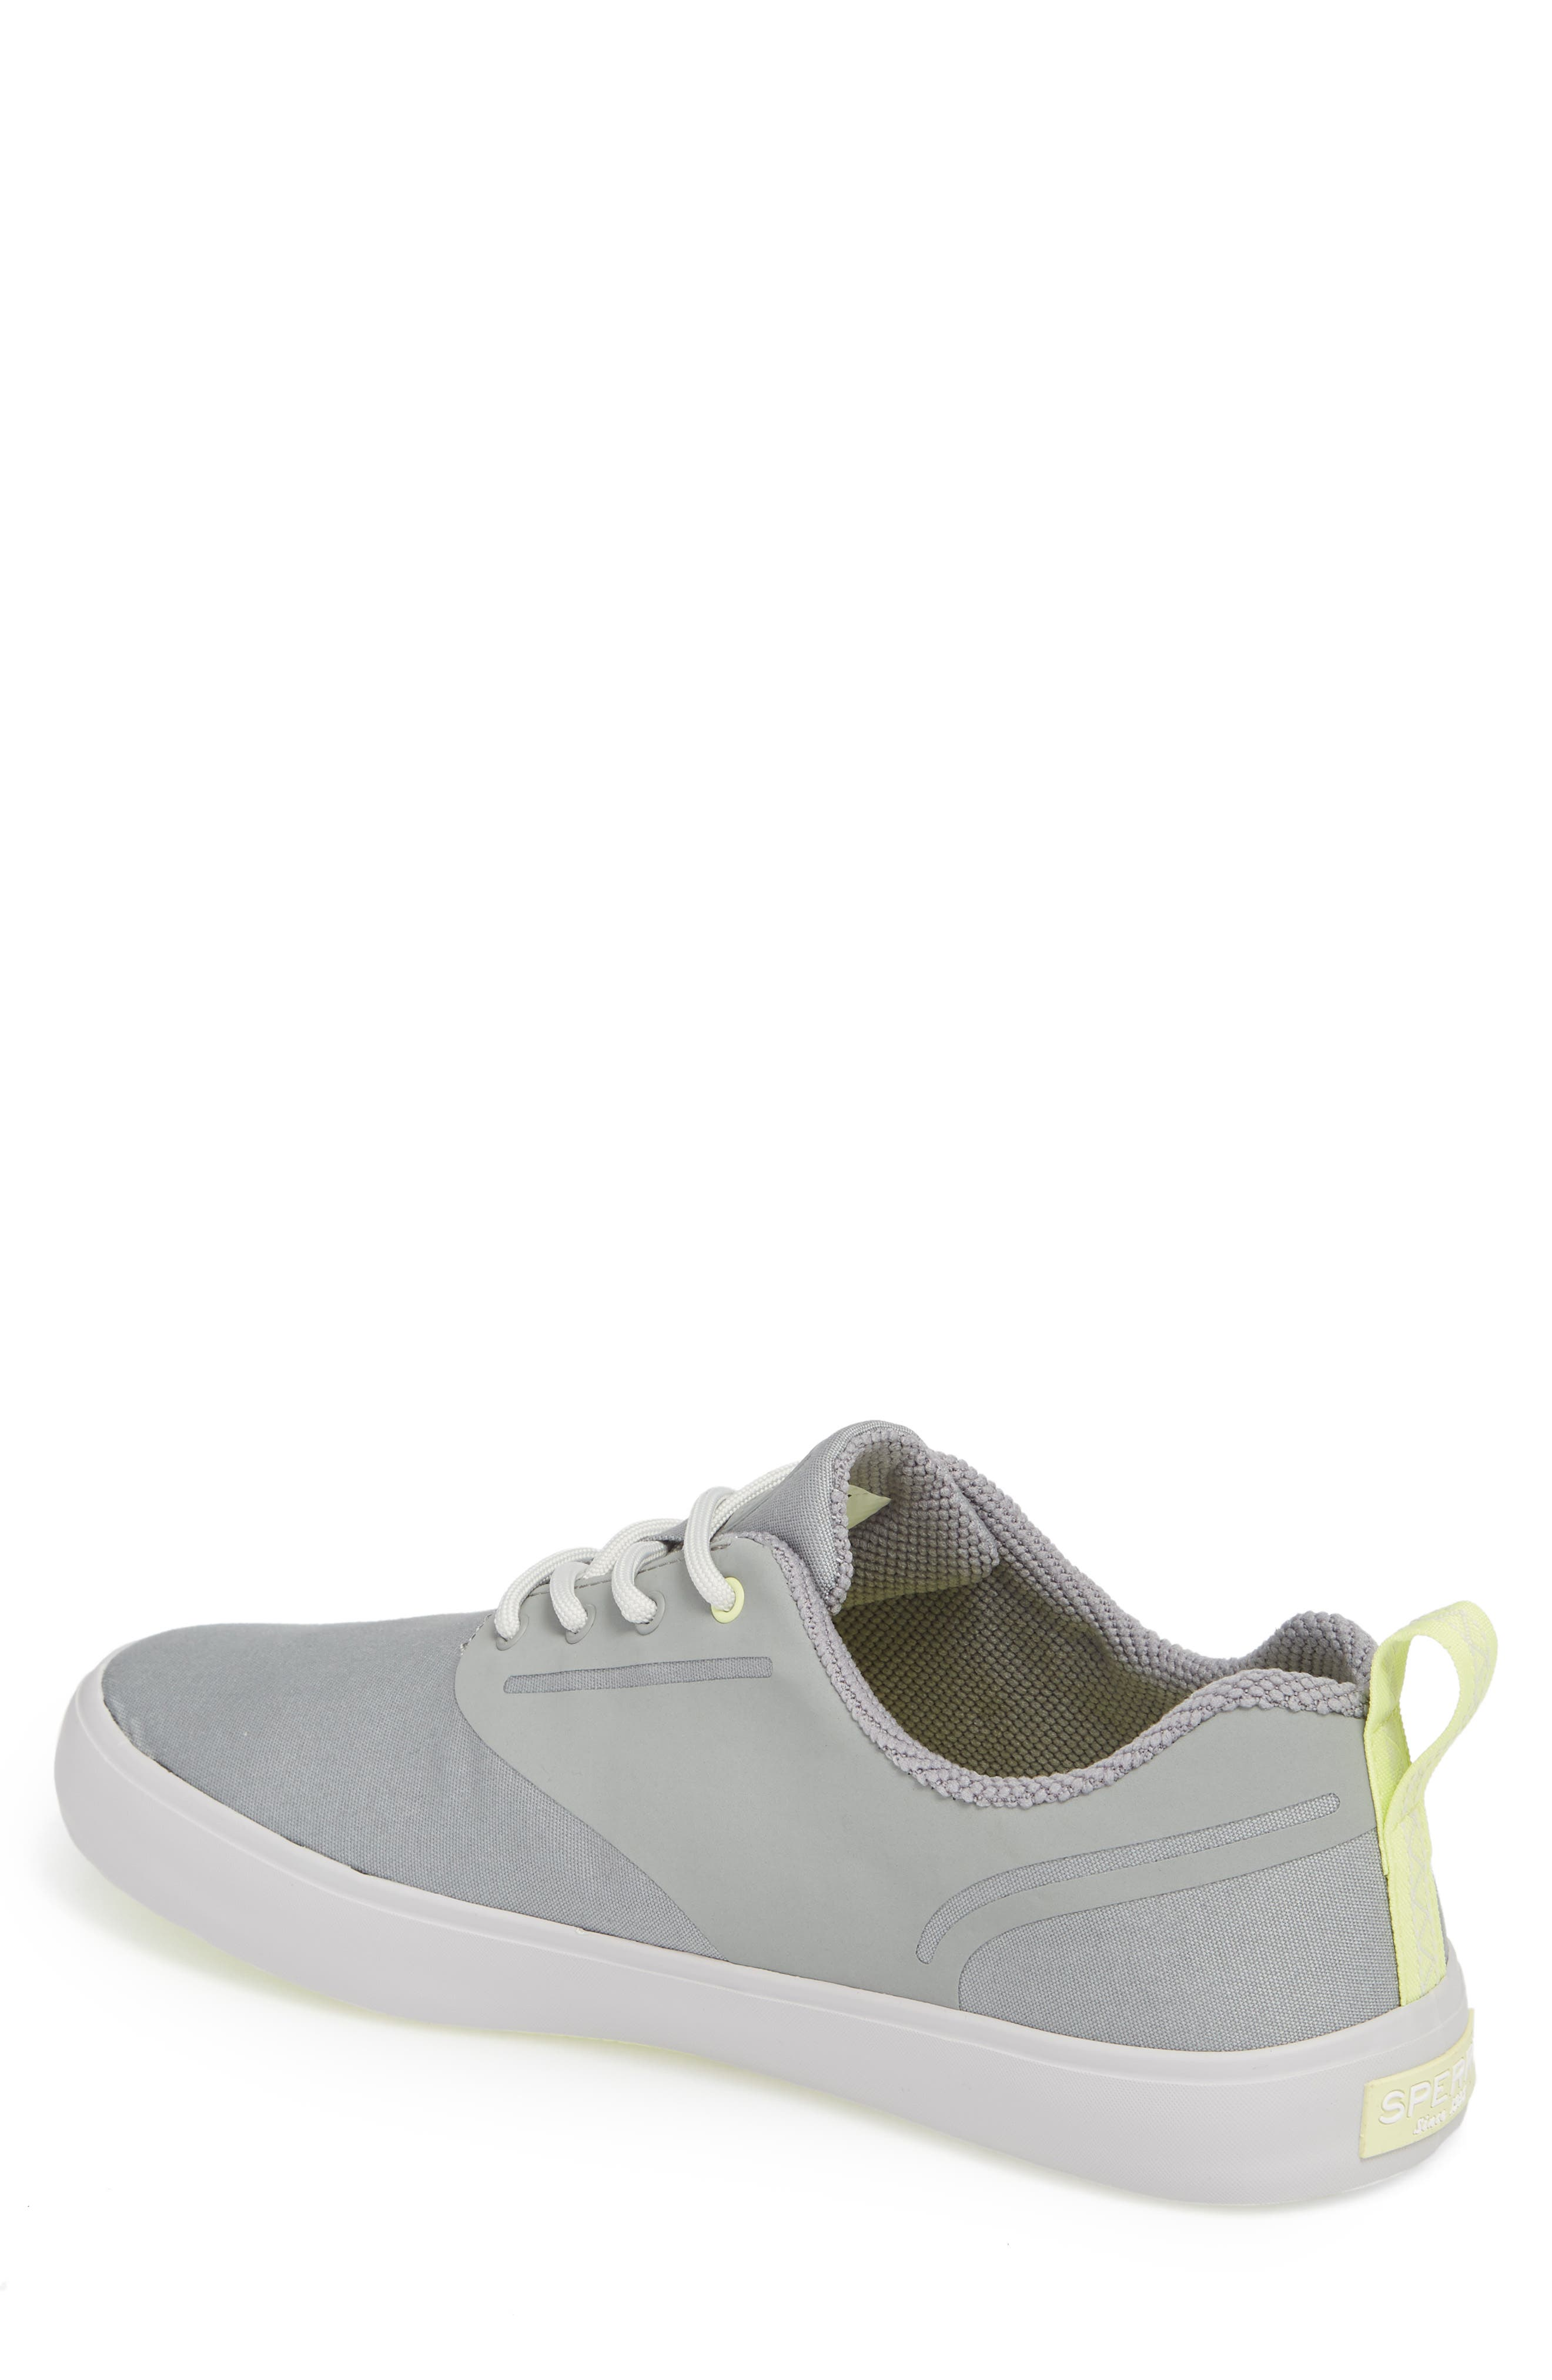 SPERRY, Flex Deck CVO Sneaker, Alternate thumbnail 2, color, GREY